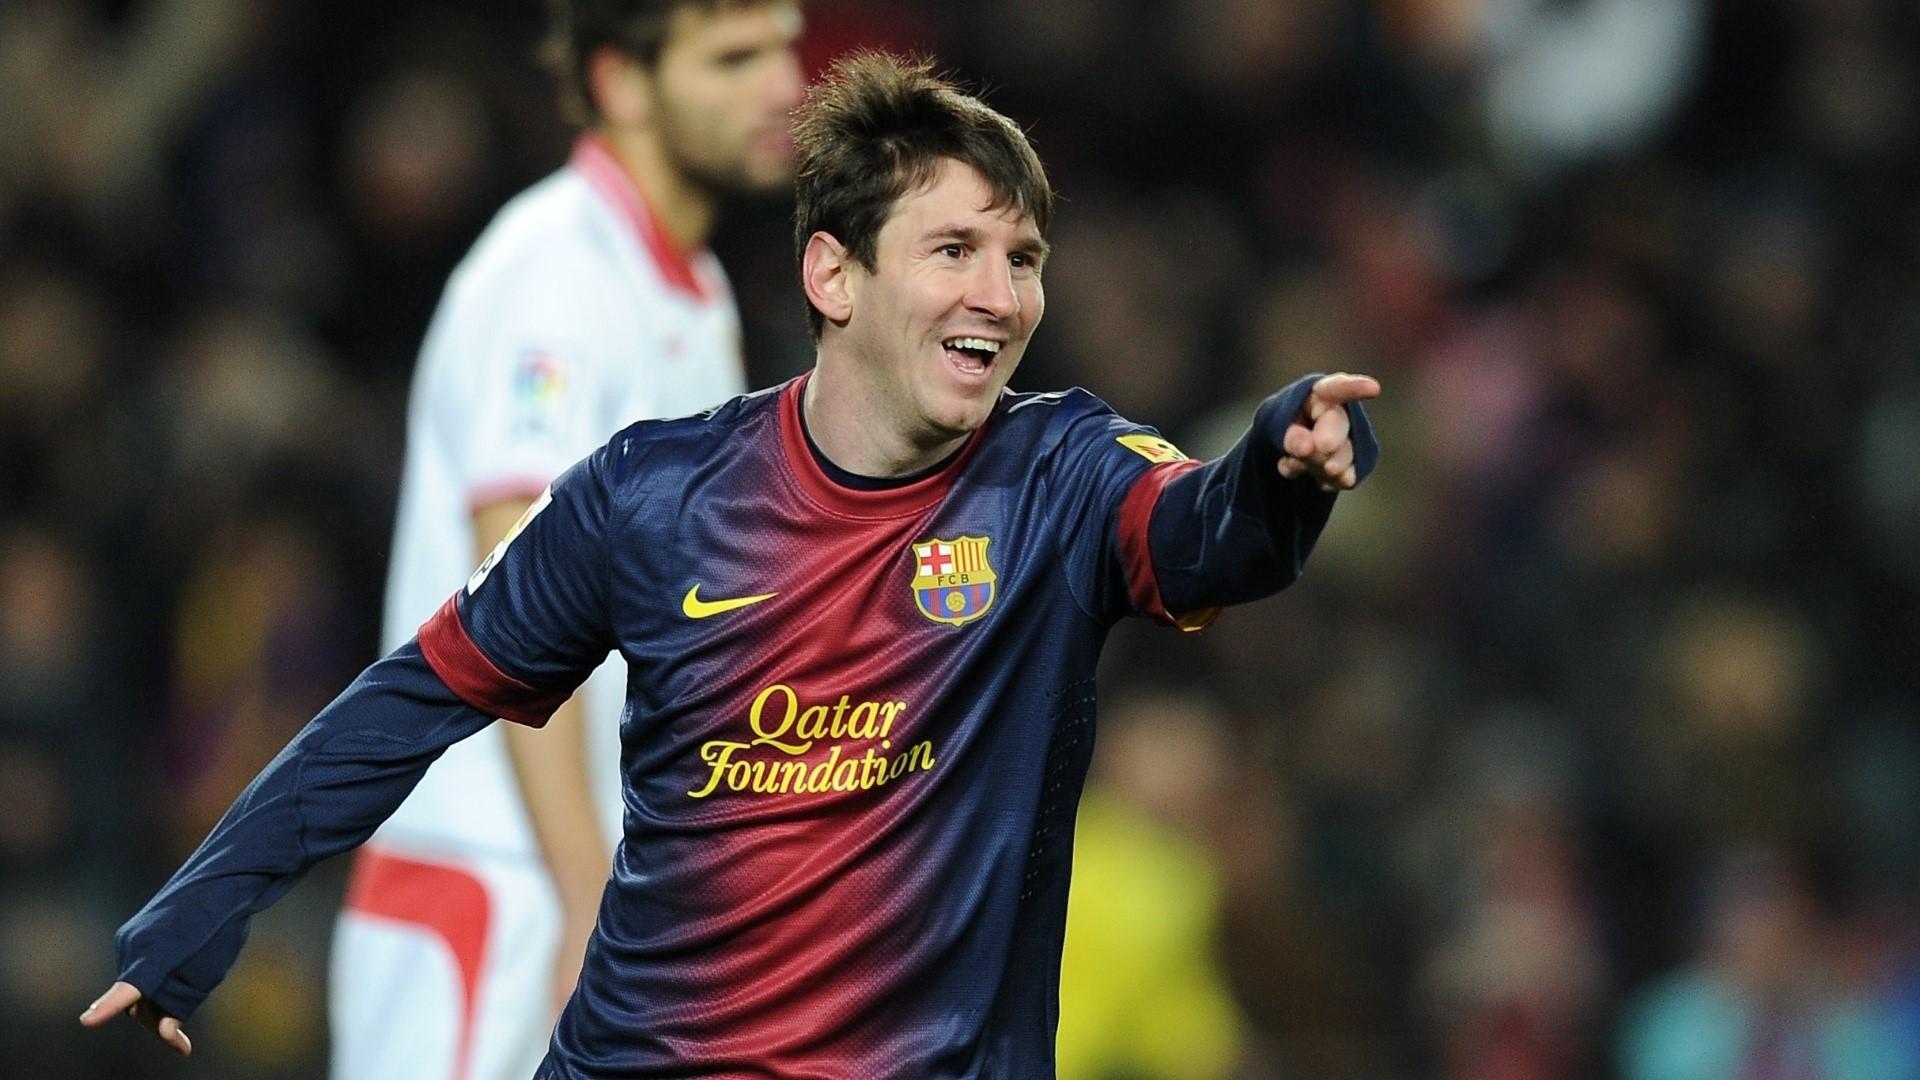 Lionel Messi Background images